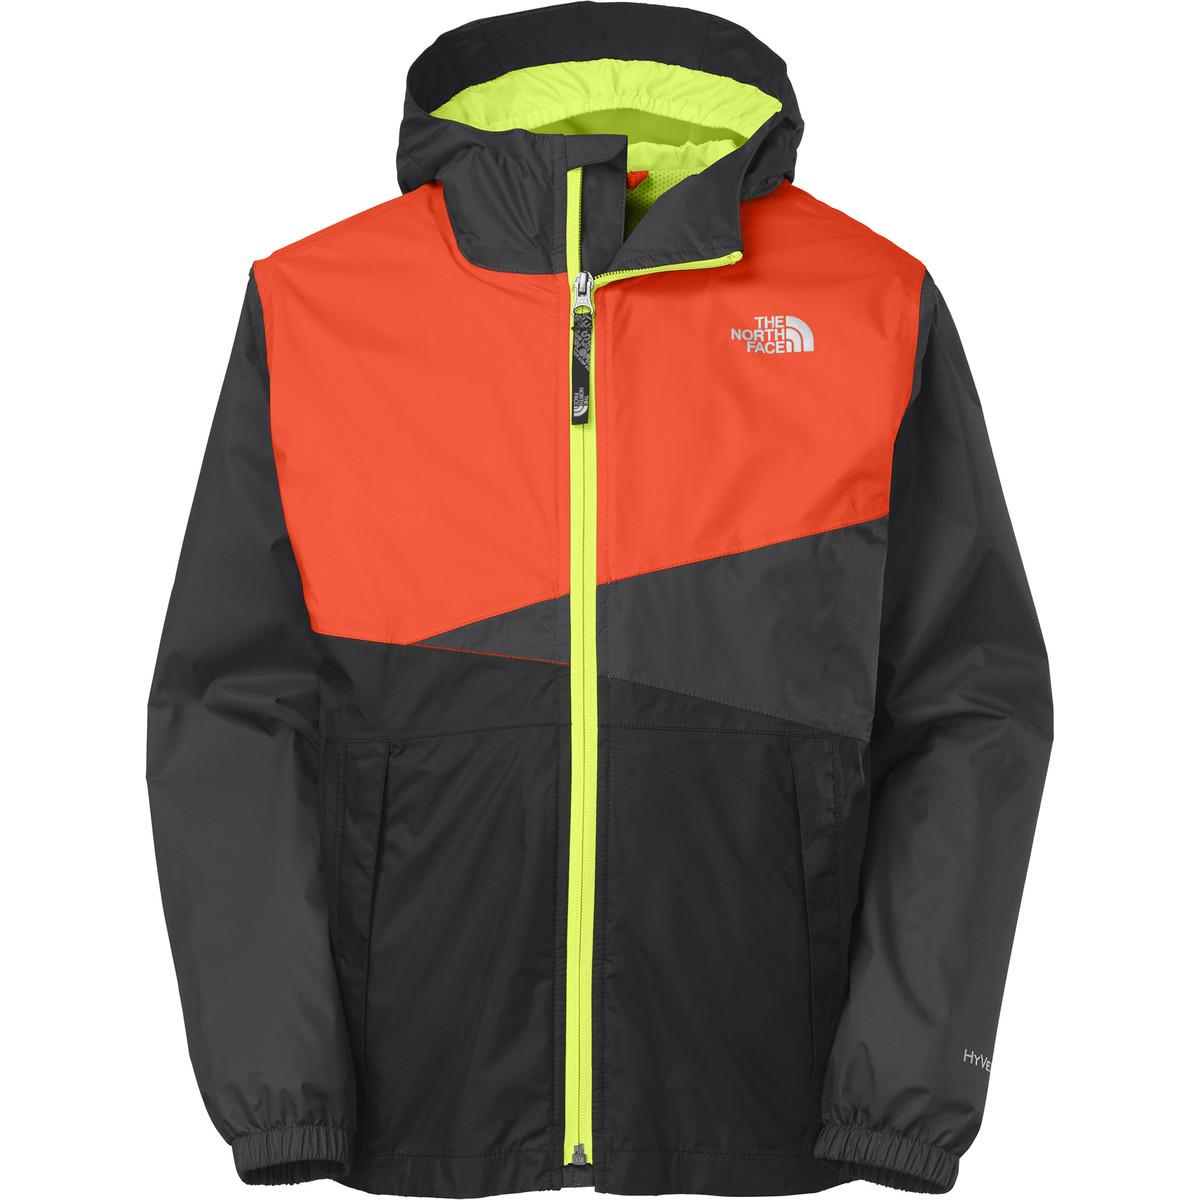 The North Face Tavoy Lined Rain Jacket